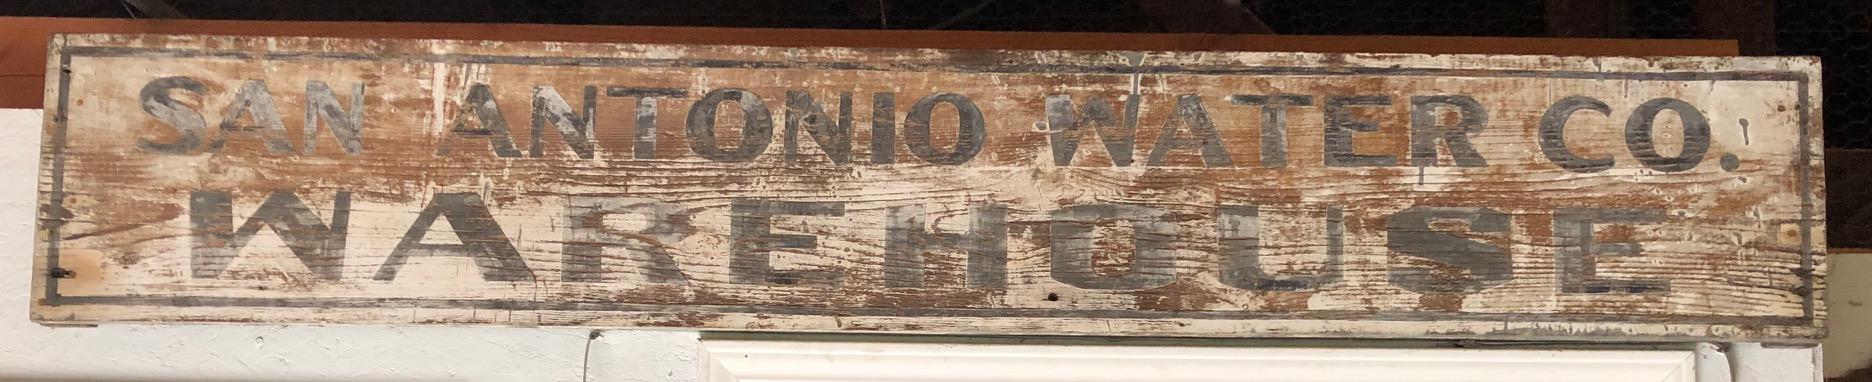 Old Sign - San Antonio Water Co. Warehouse